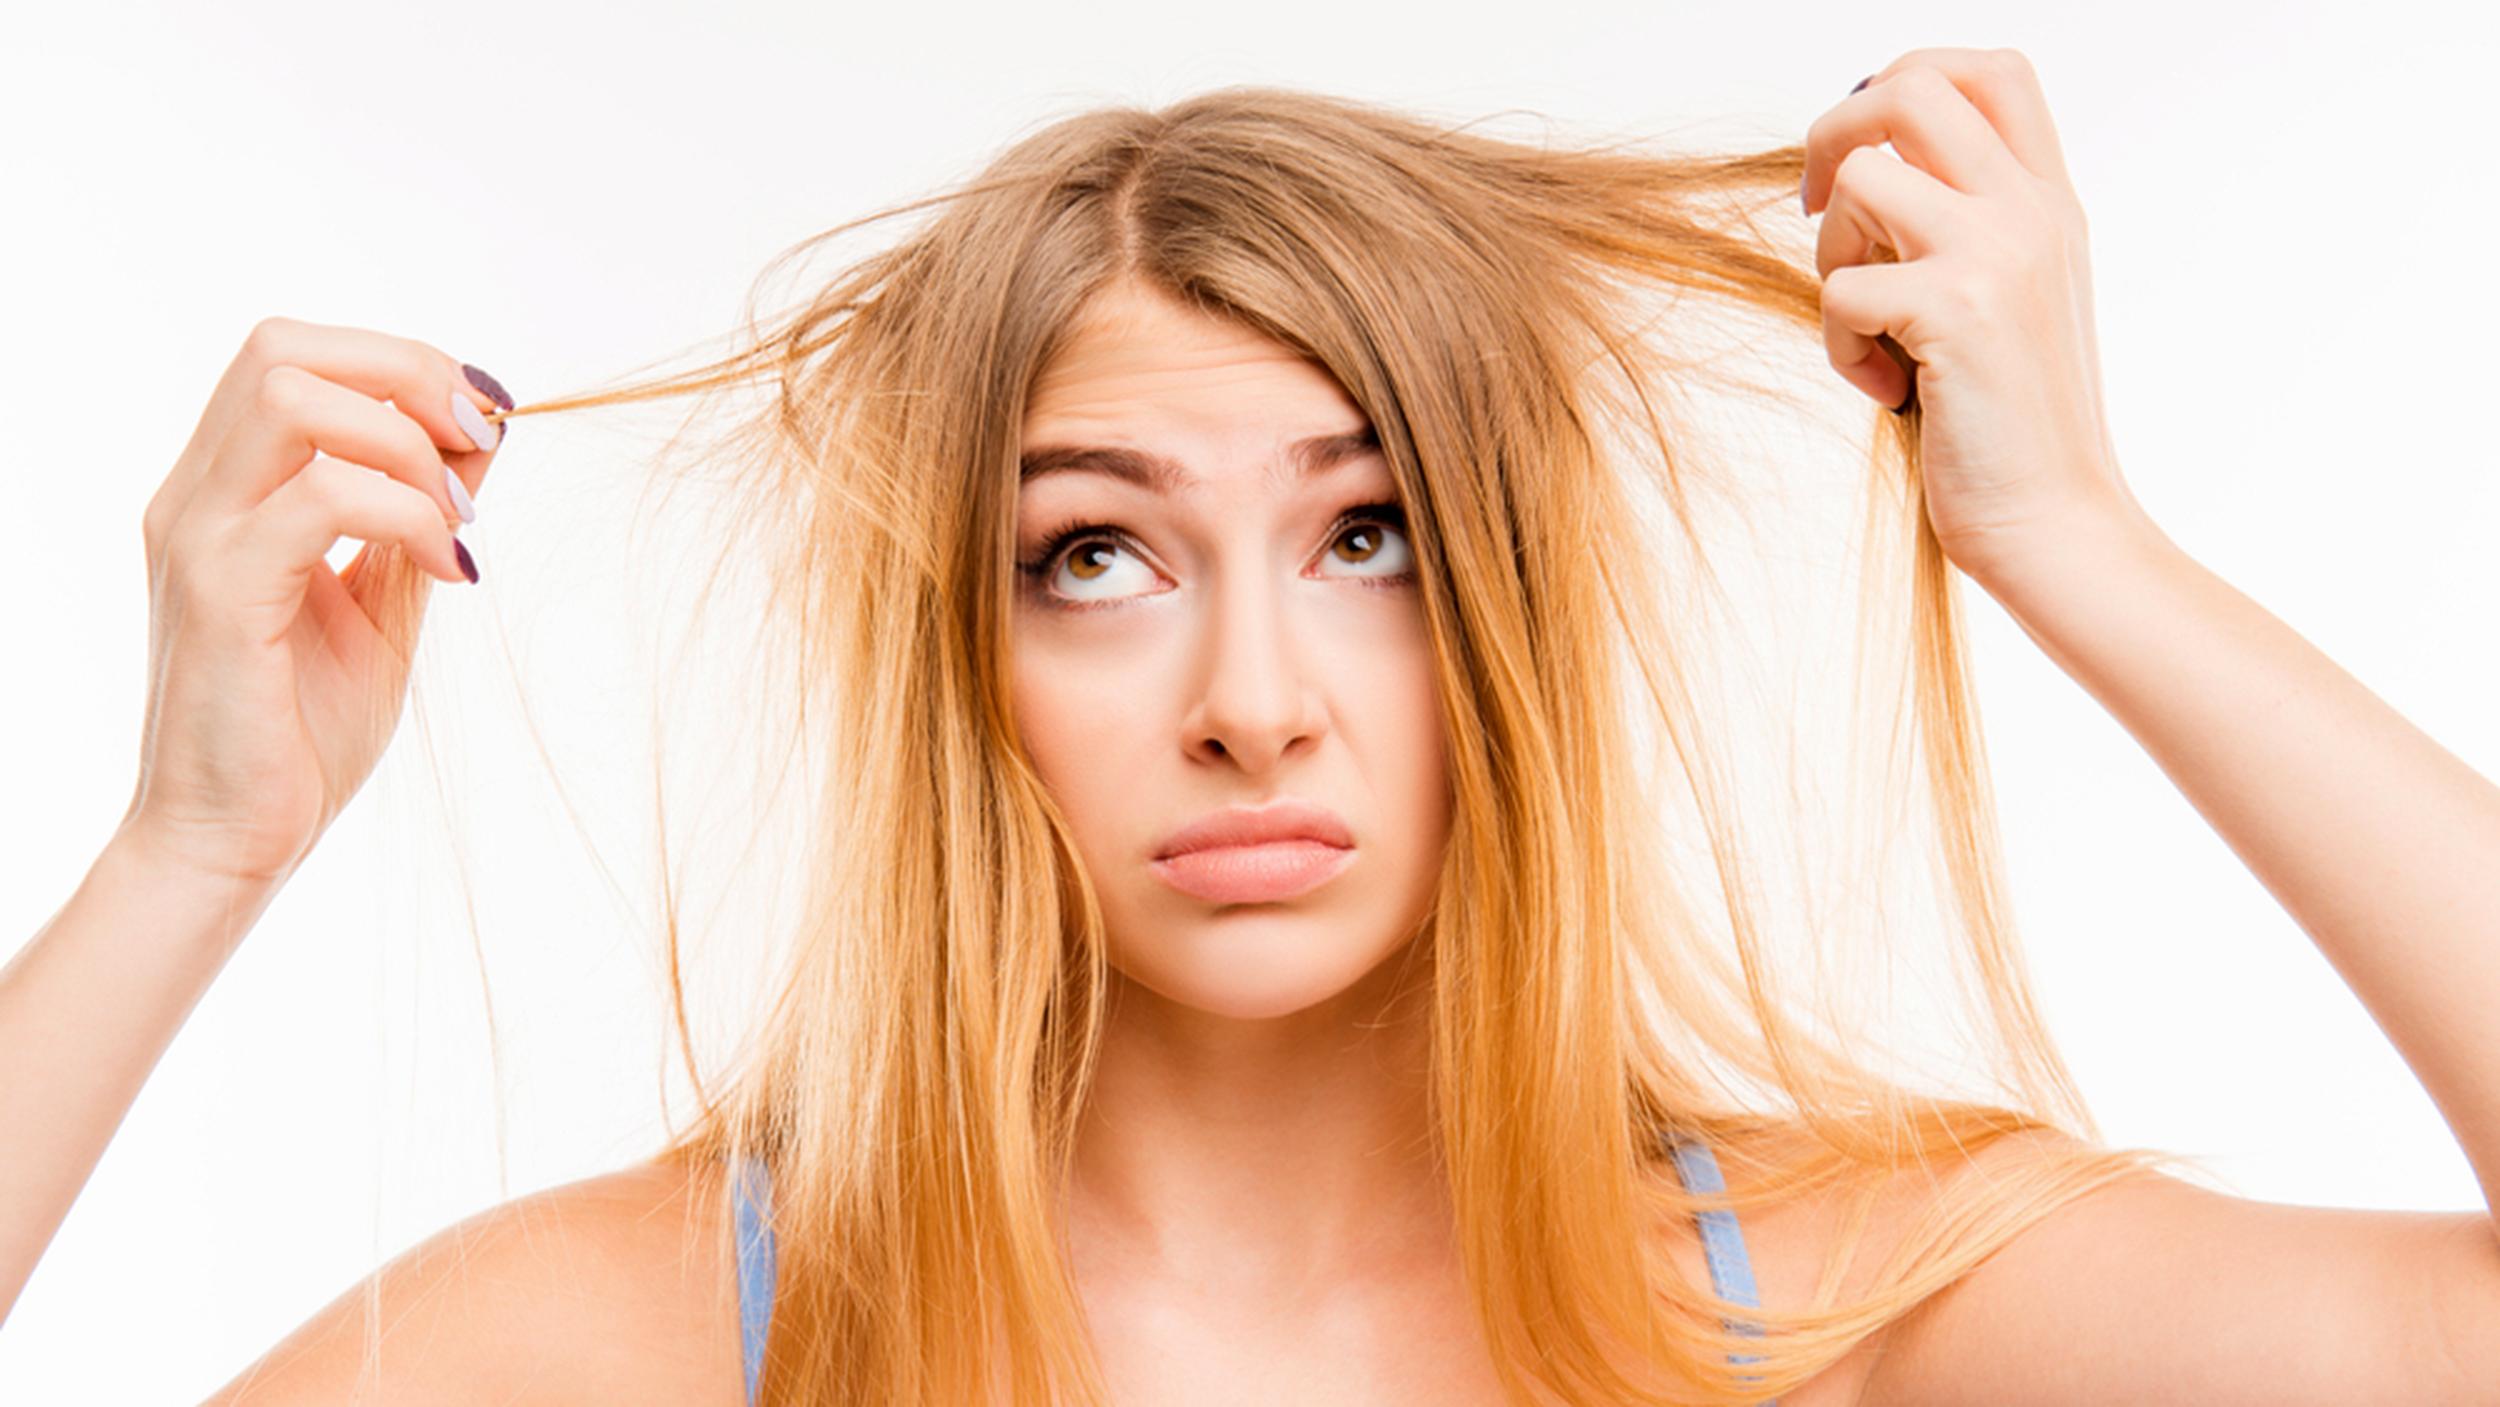 woman-hair-messy-stock-today-160707-tease_6534dc2d59526e08560104023b634e5f